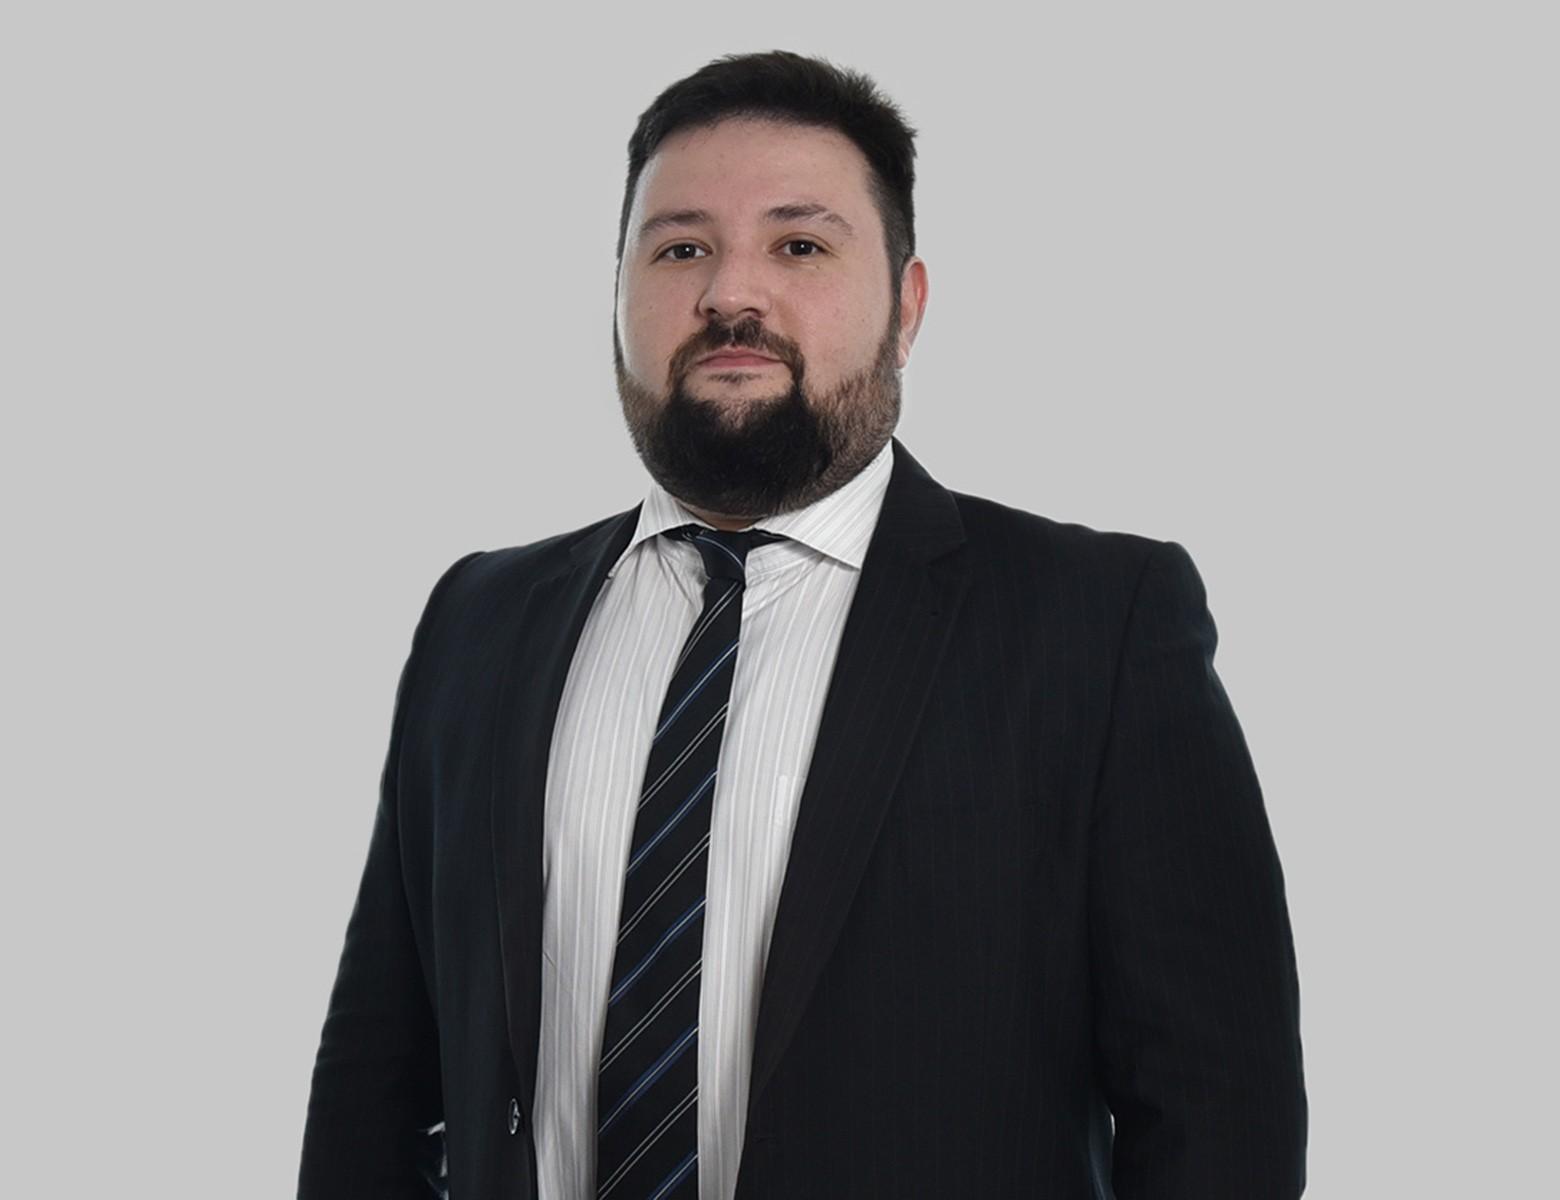 Alisher Ismatov